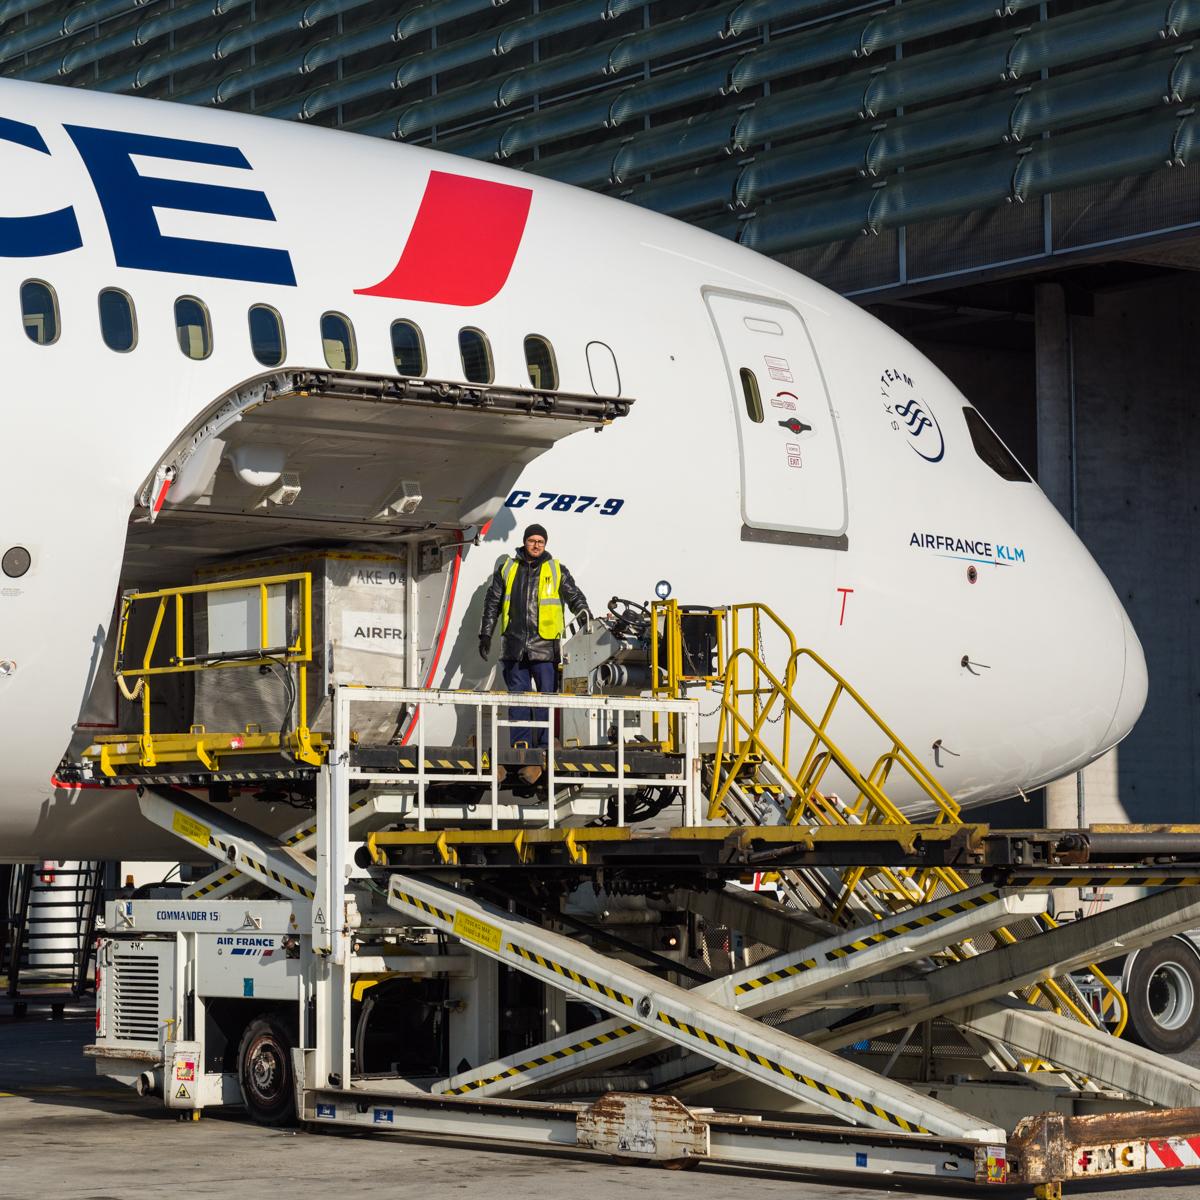 Air France at Work Ramp (1 of 5).jpg